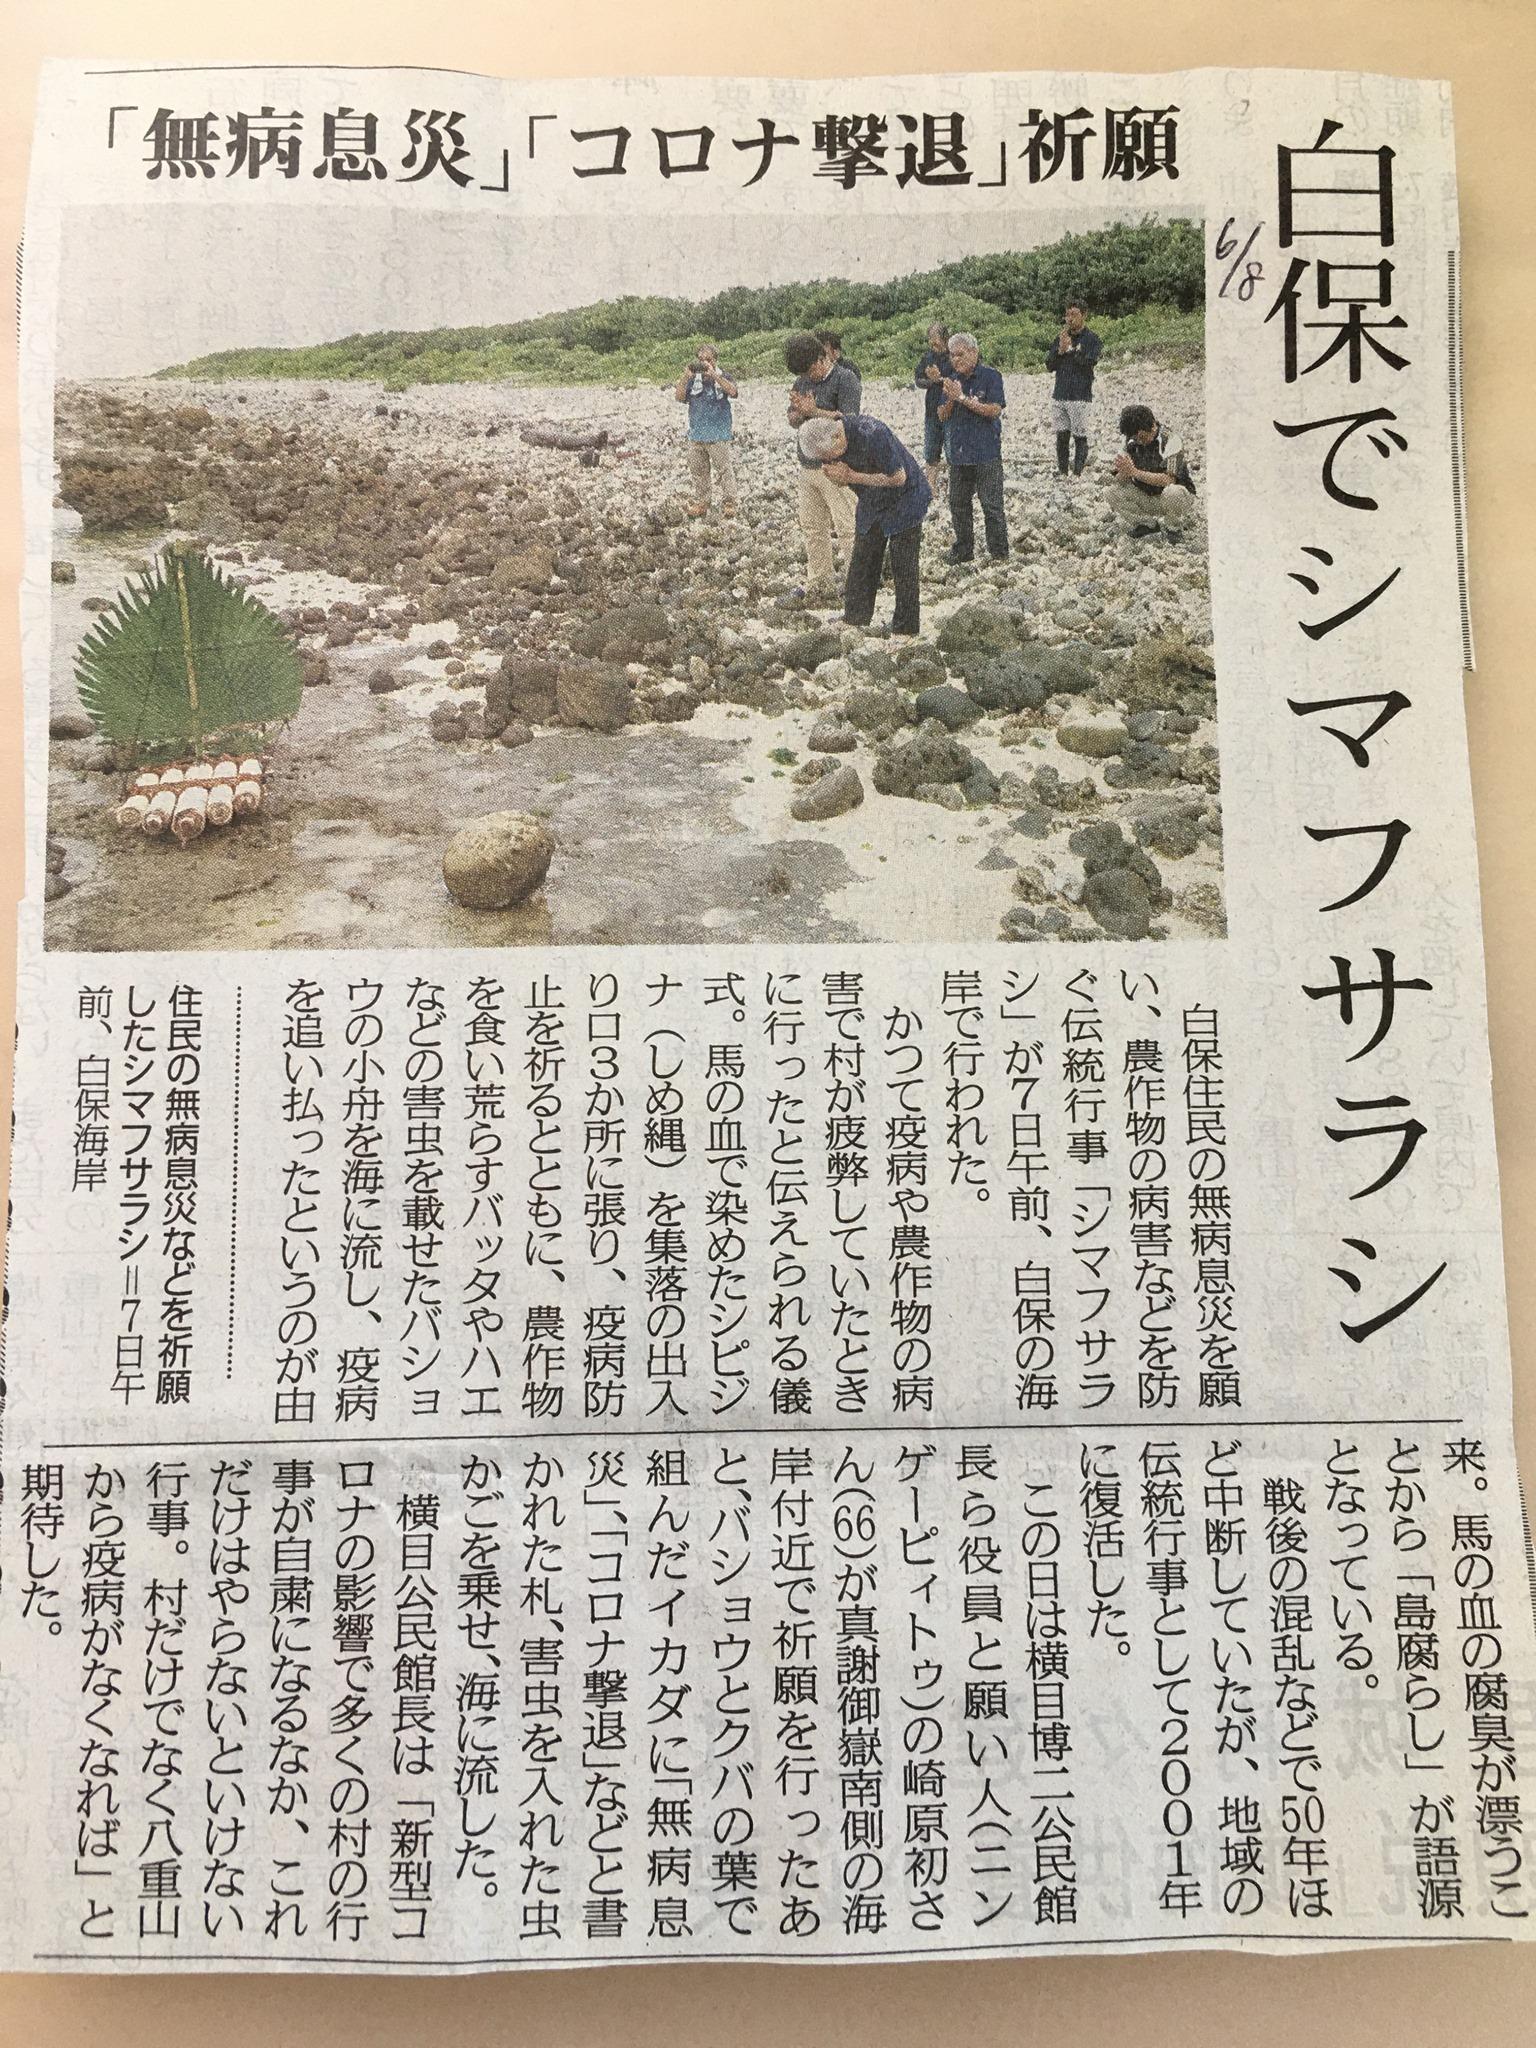 石垣島の文化/無病息災